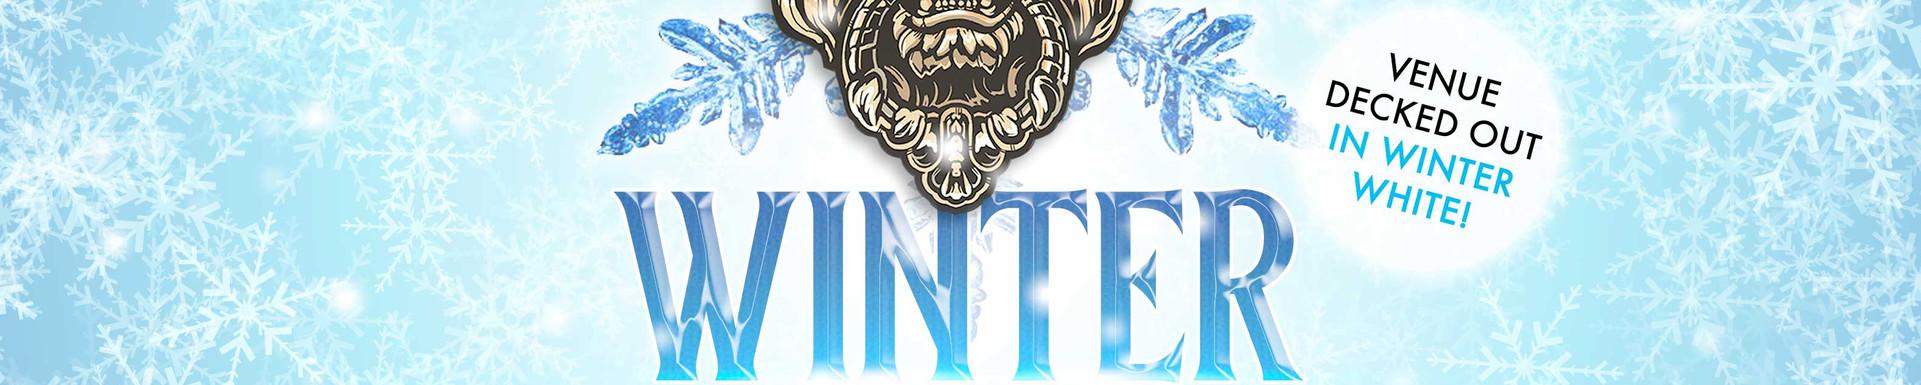 Embassy Presents: Winter Wonderland